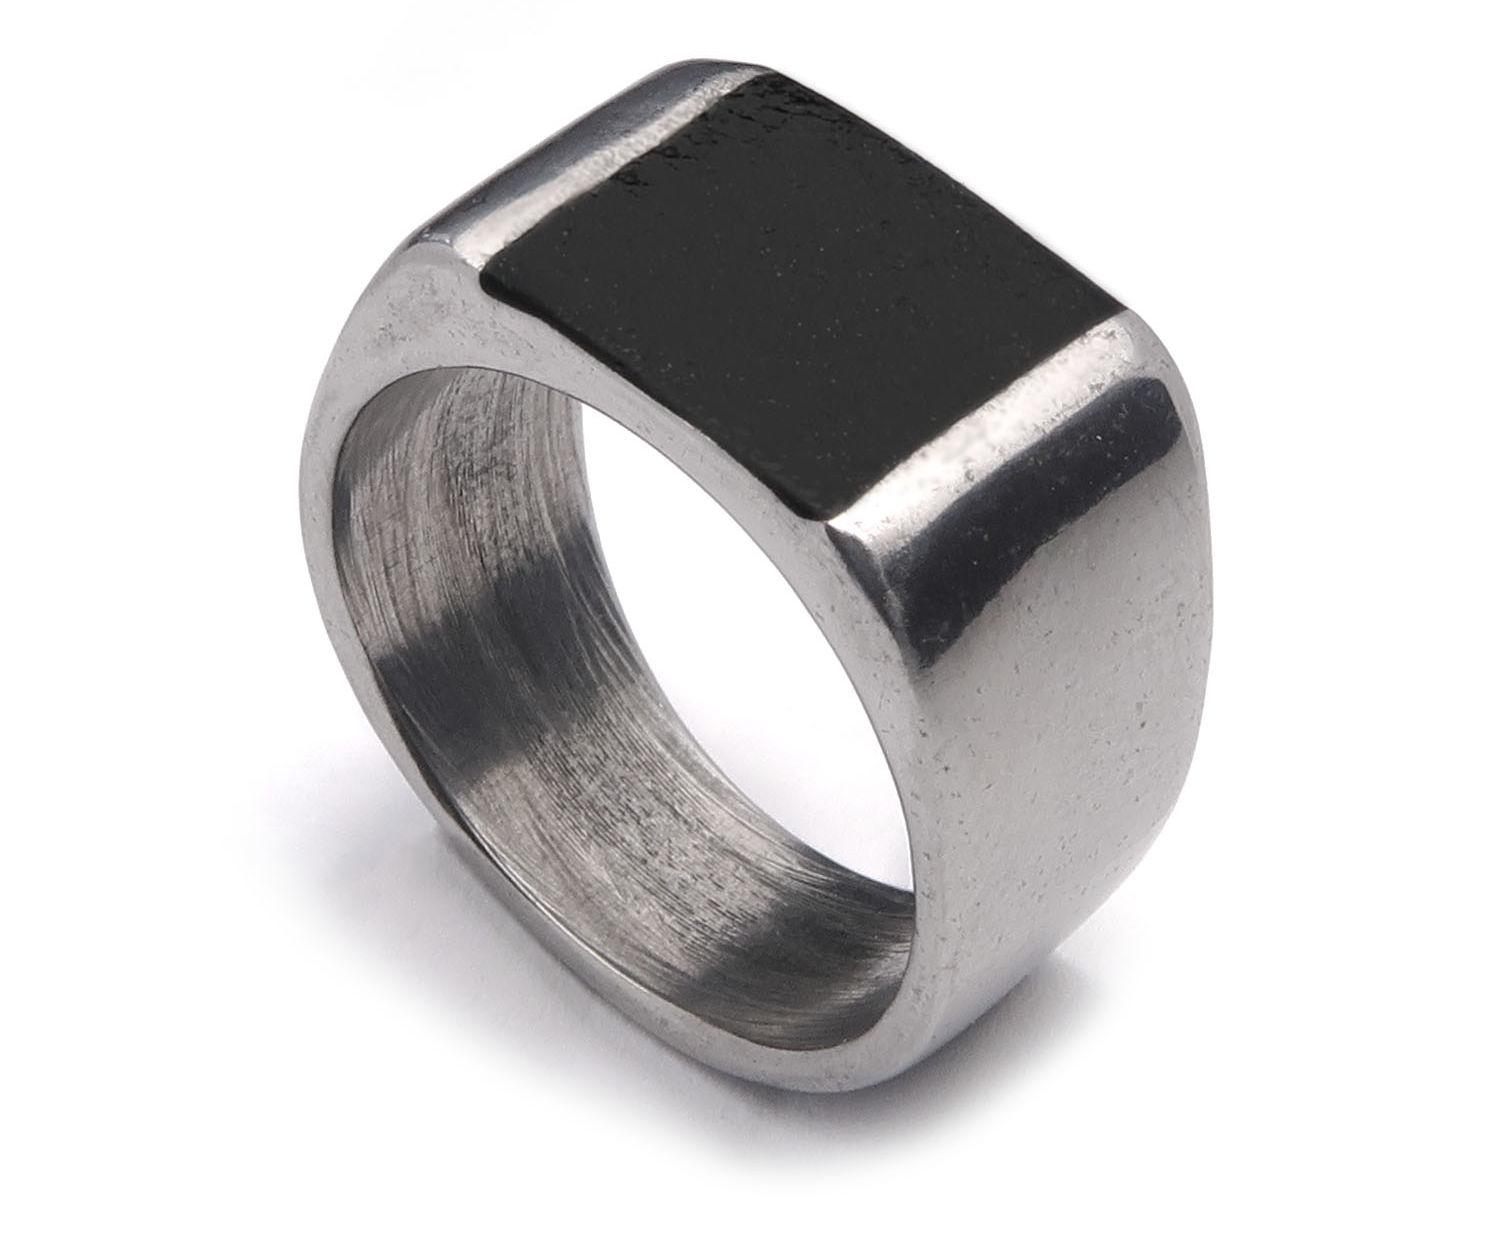 Nut Ring, Manly Design!